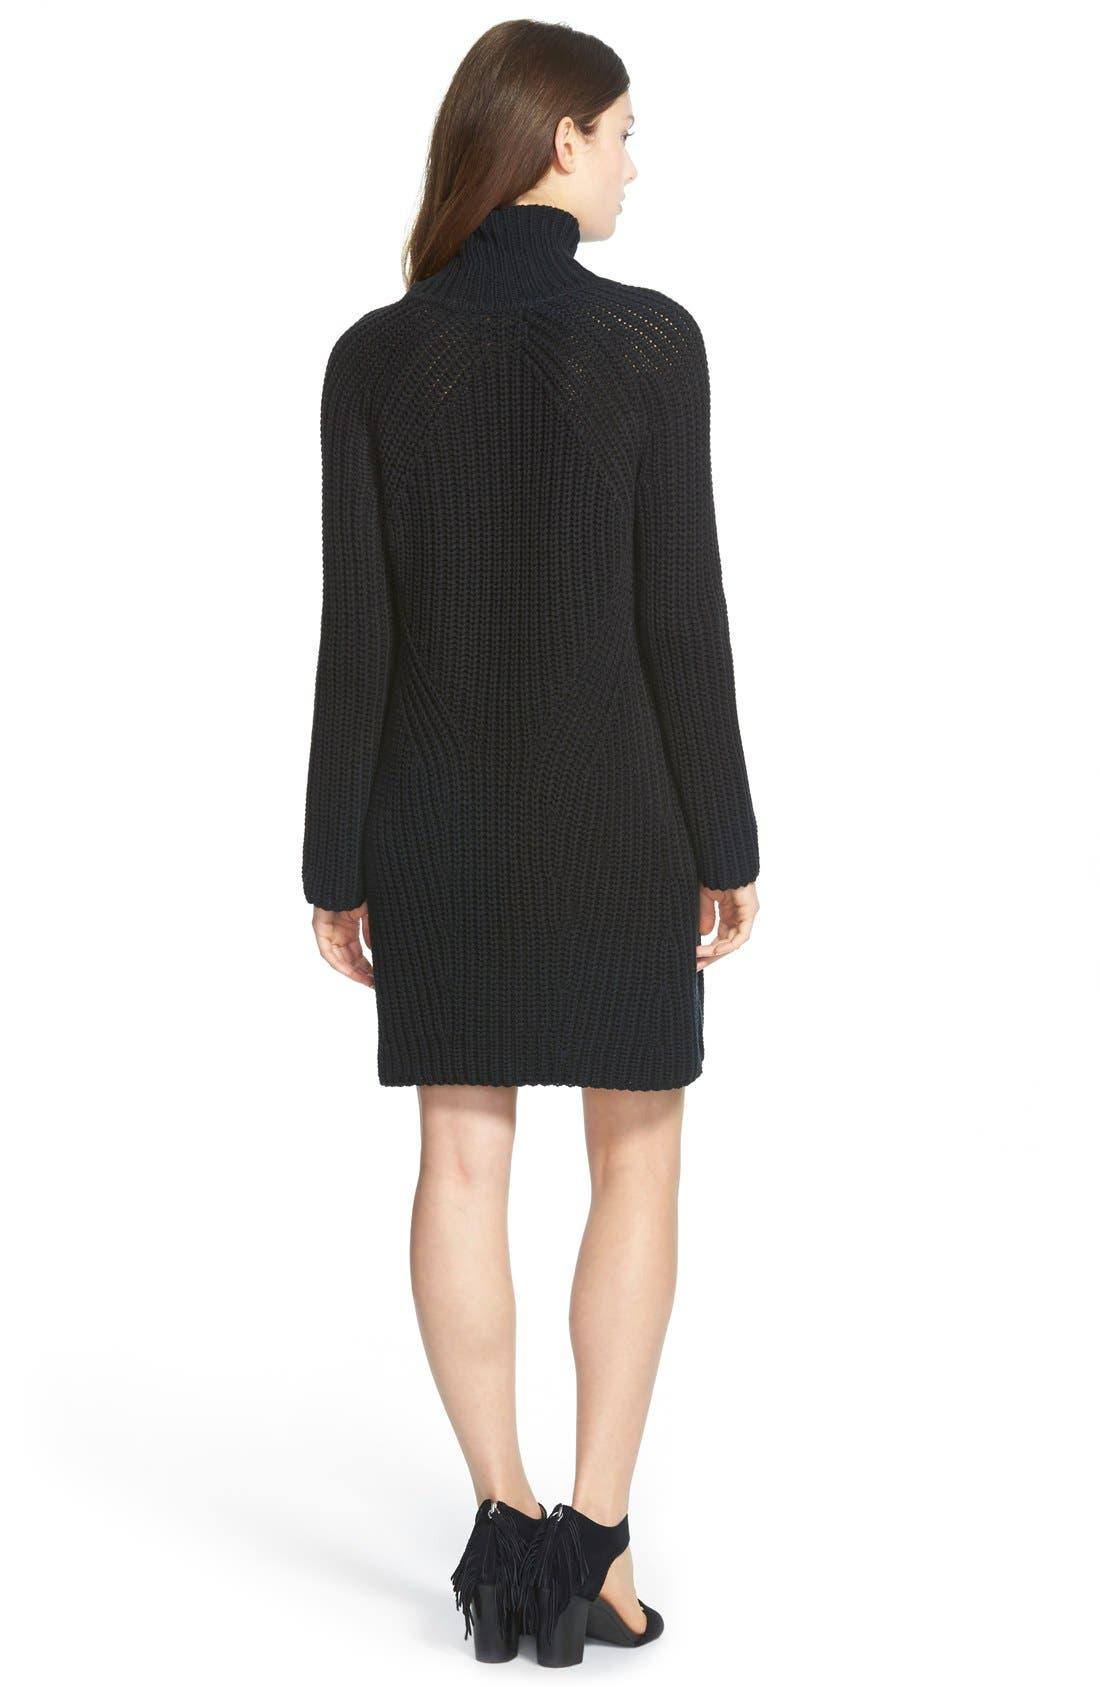 TREASURE & BOND, Treasure&Bond Turtleneck Sweater Dress, Alternate thumbnail 3, color, 001